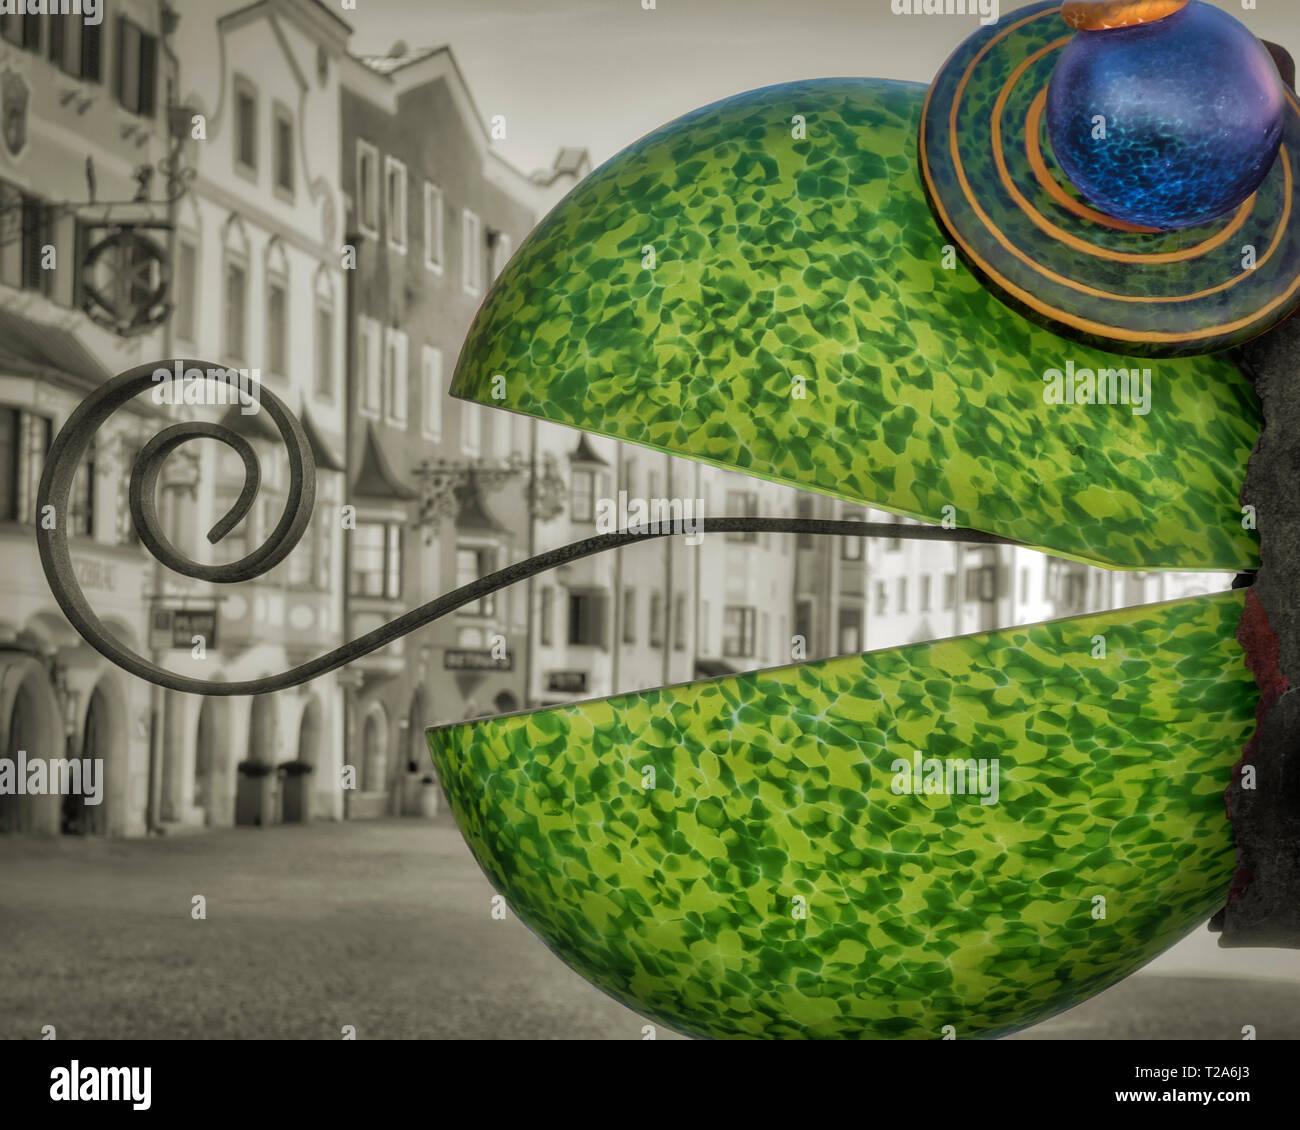 A - Tirol: Glass Ornament en el Südtirolerstrasse en la histórica ciudad de Rattenberg en el Valle Inn Imagen De Stock